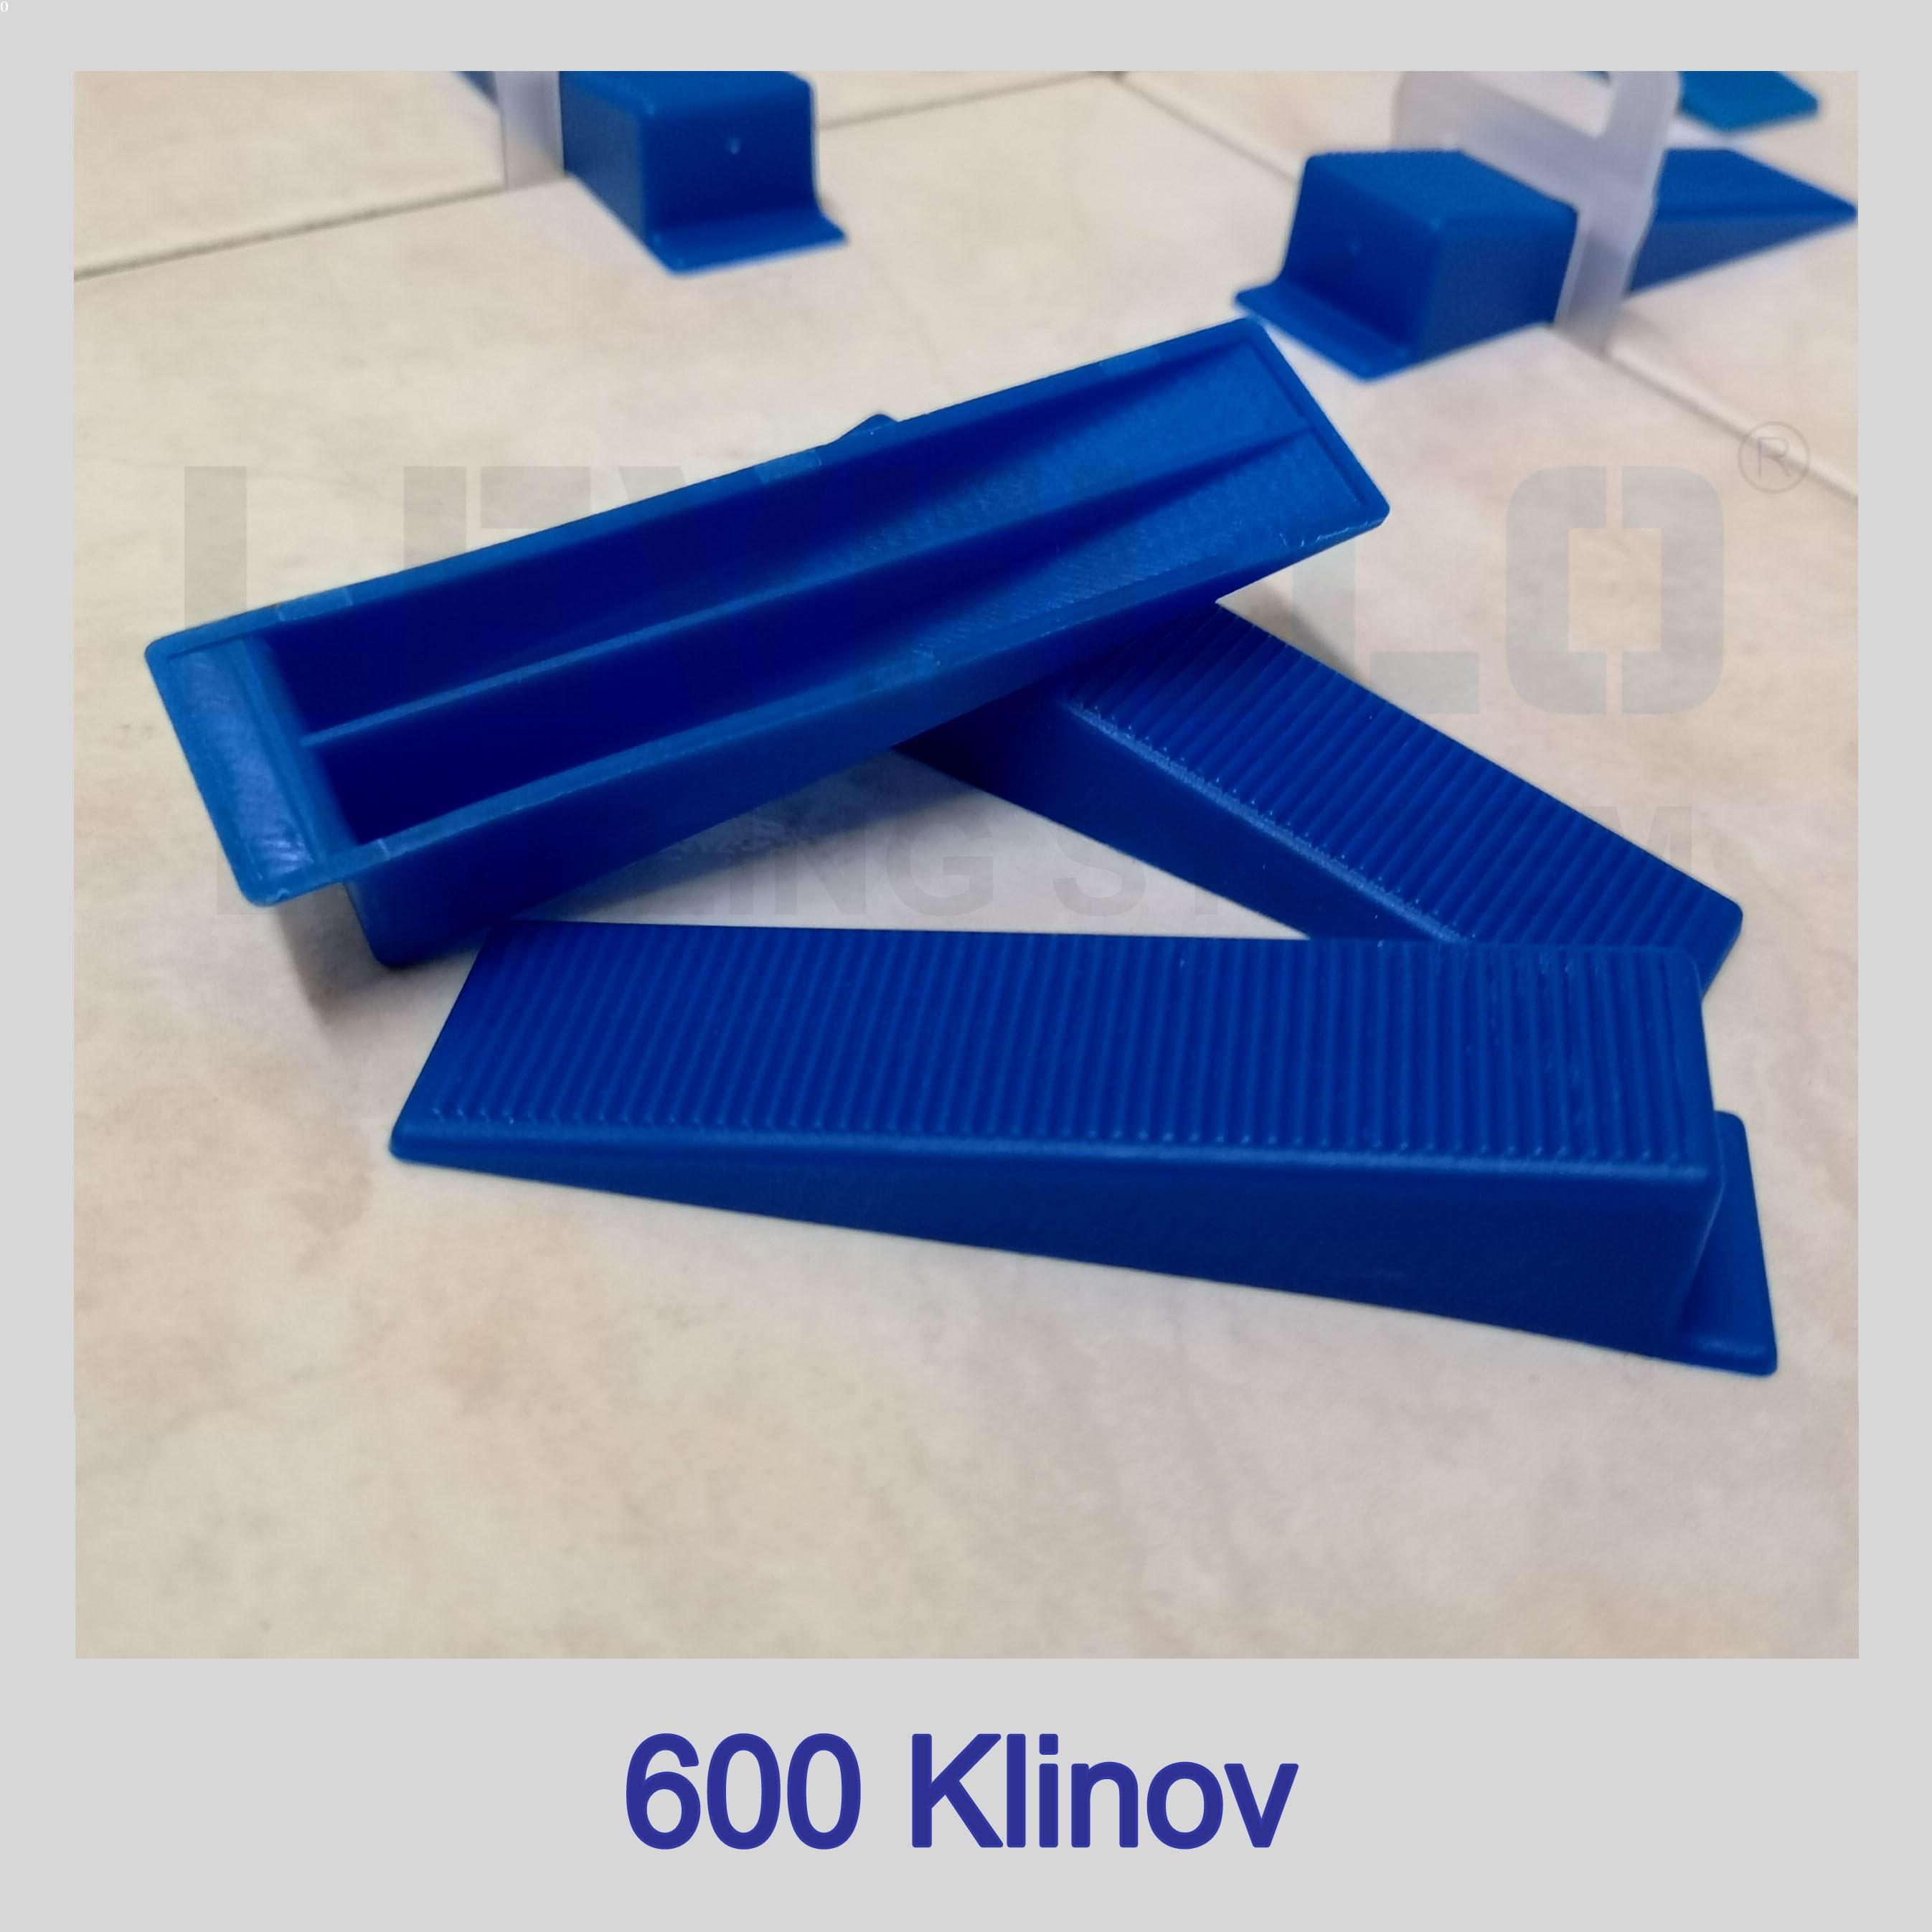 Nivelačné kliny modré, 600 kusov